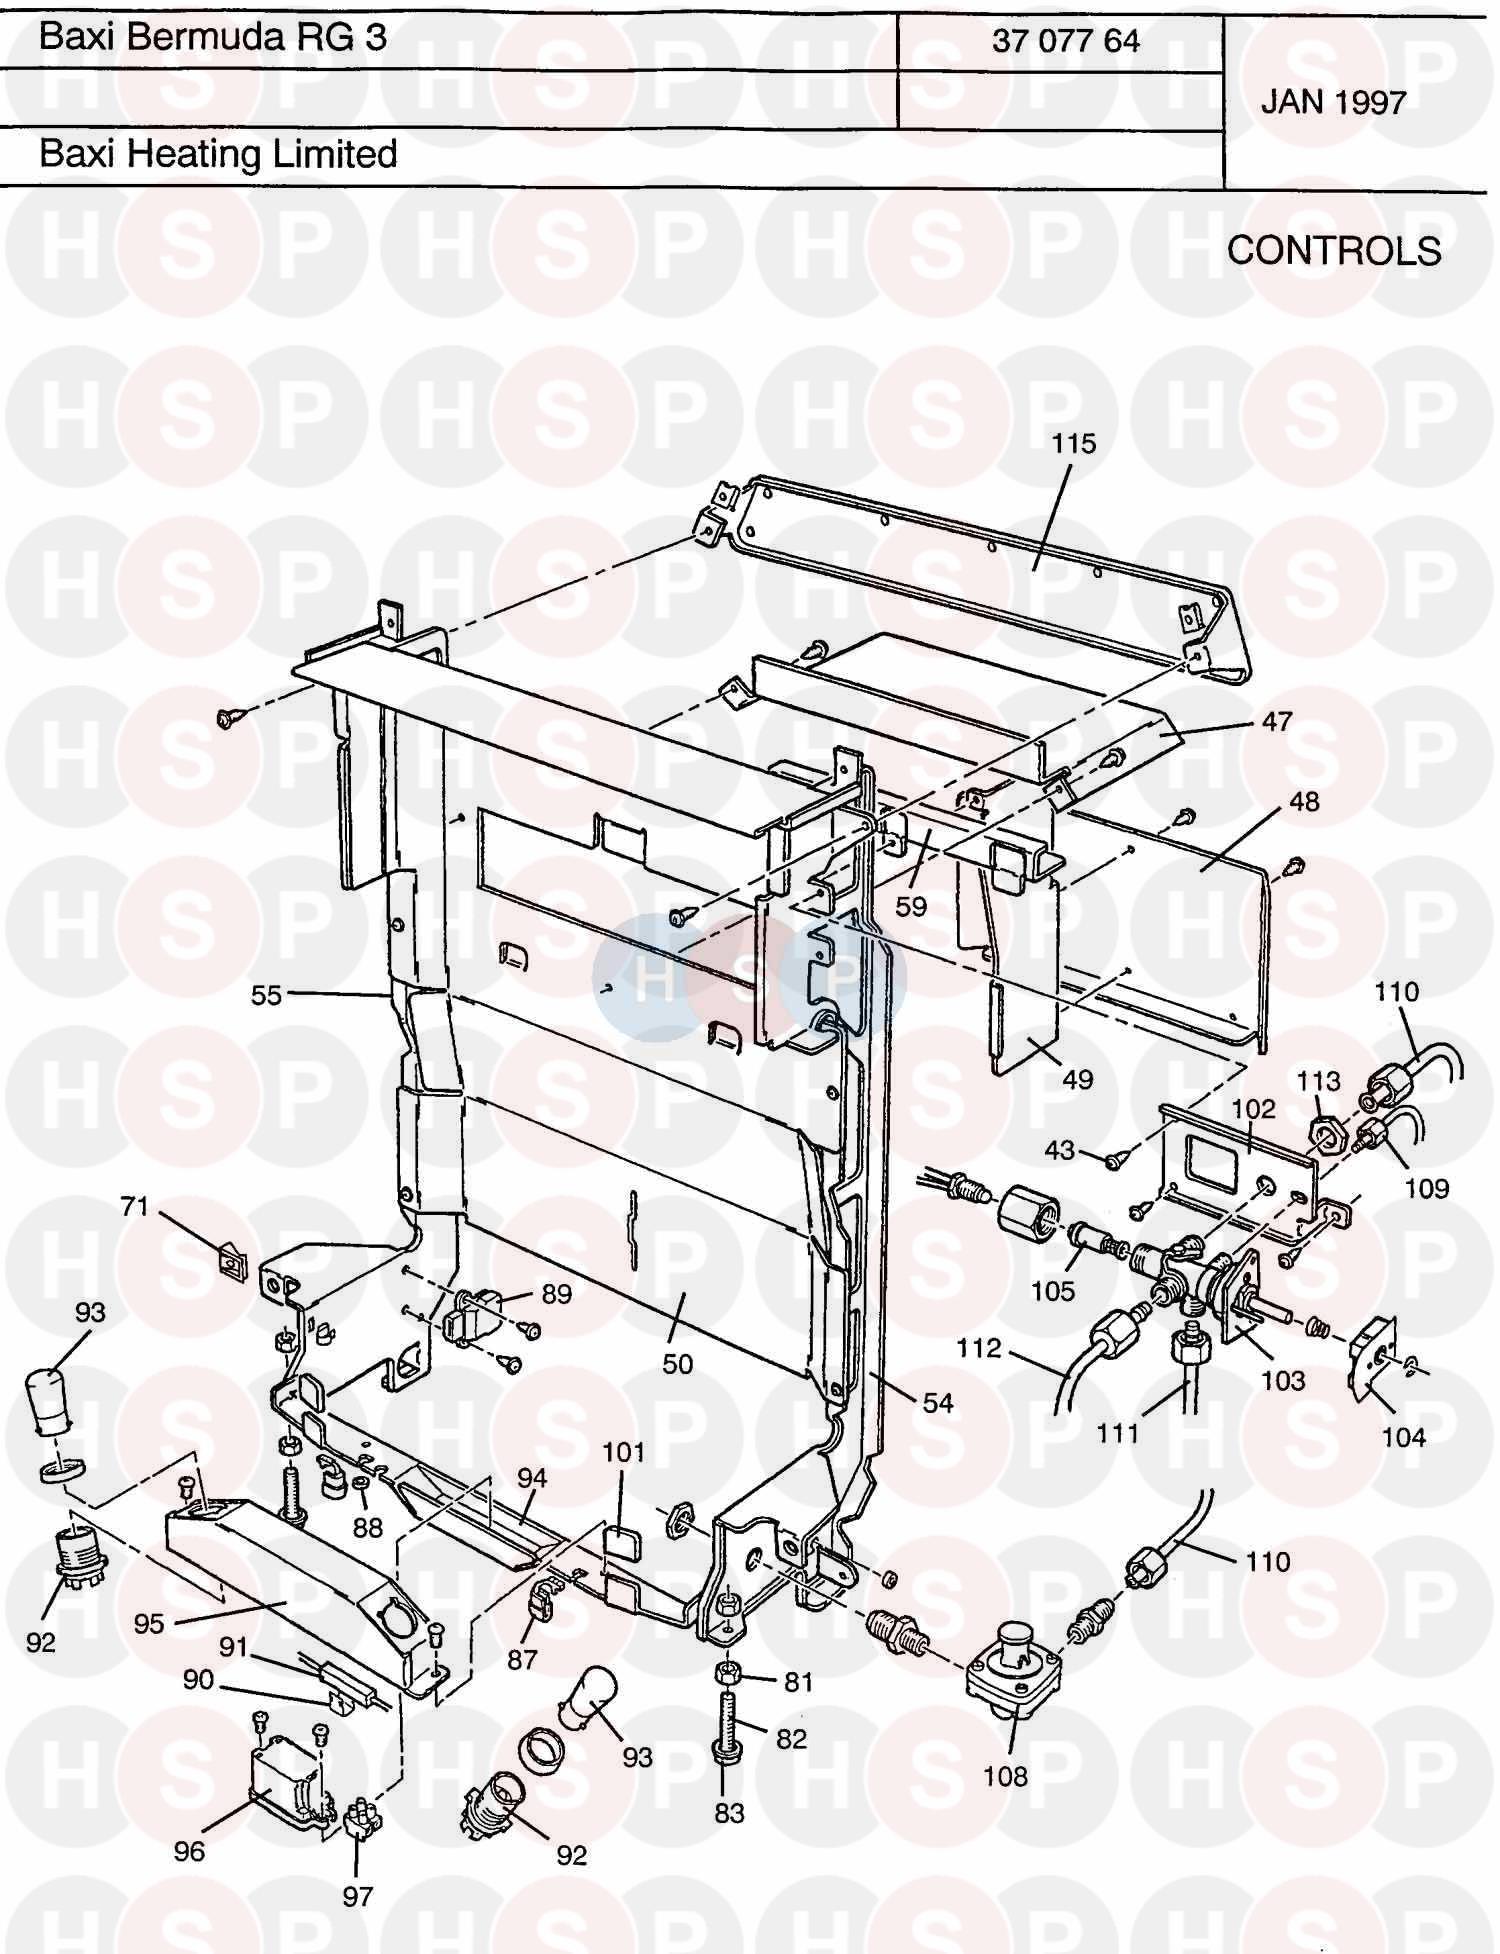 baxi bermuda rg3 renewal ng appliance diagram  controls